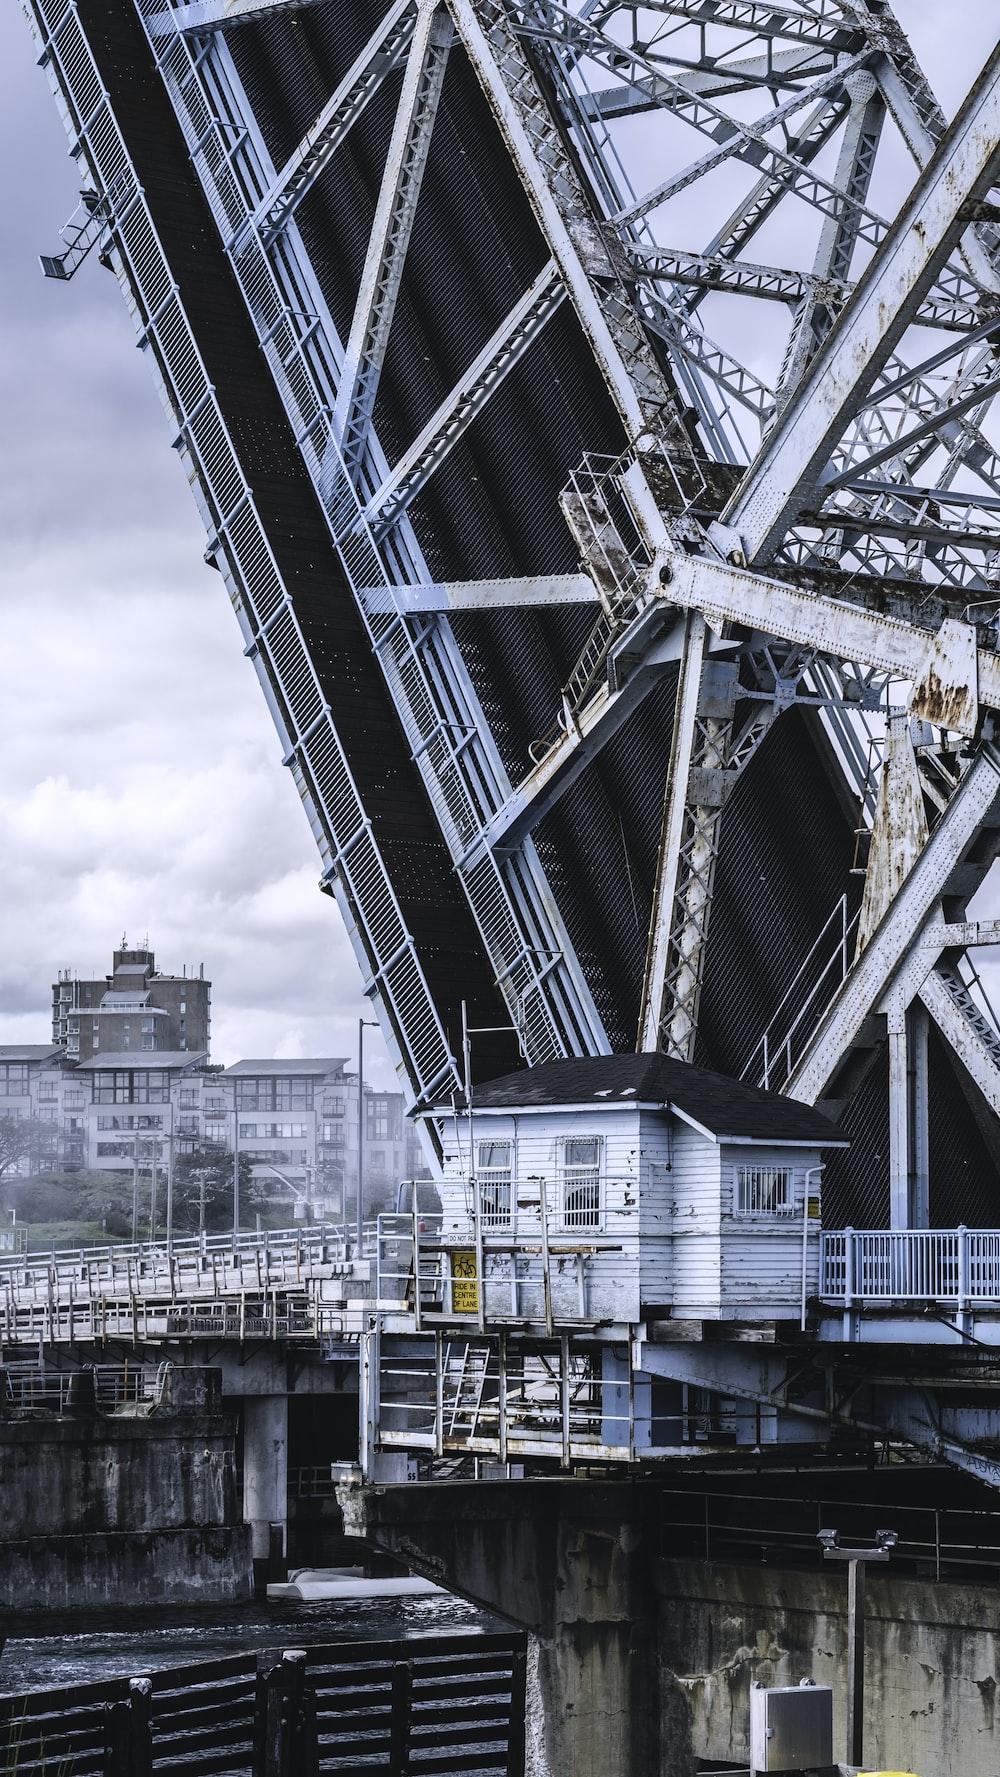 black, white, and black bascule bridge under white skies